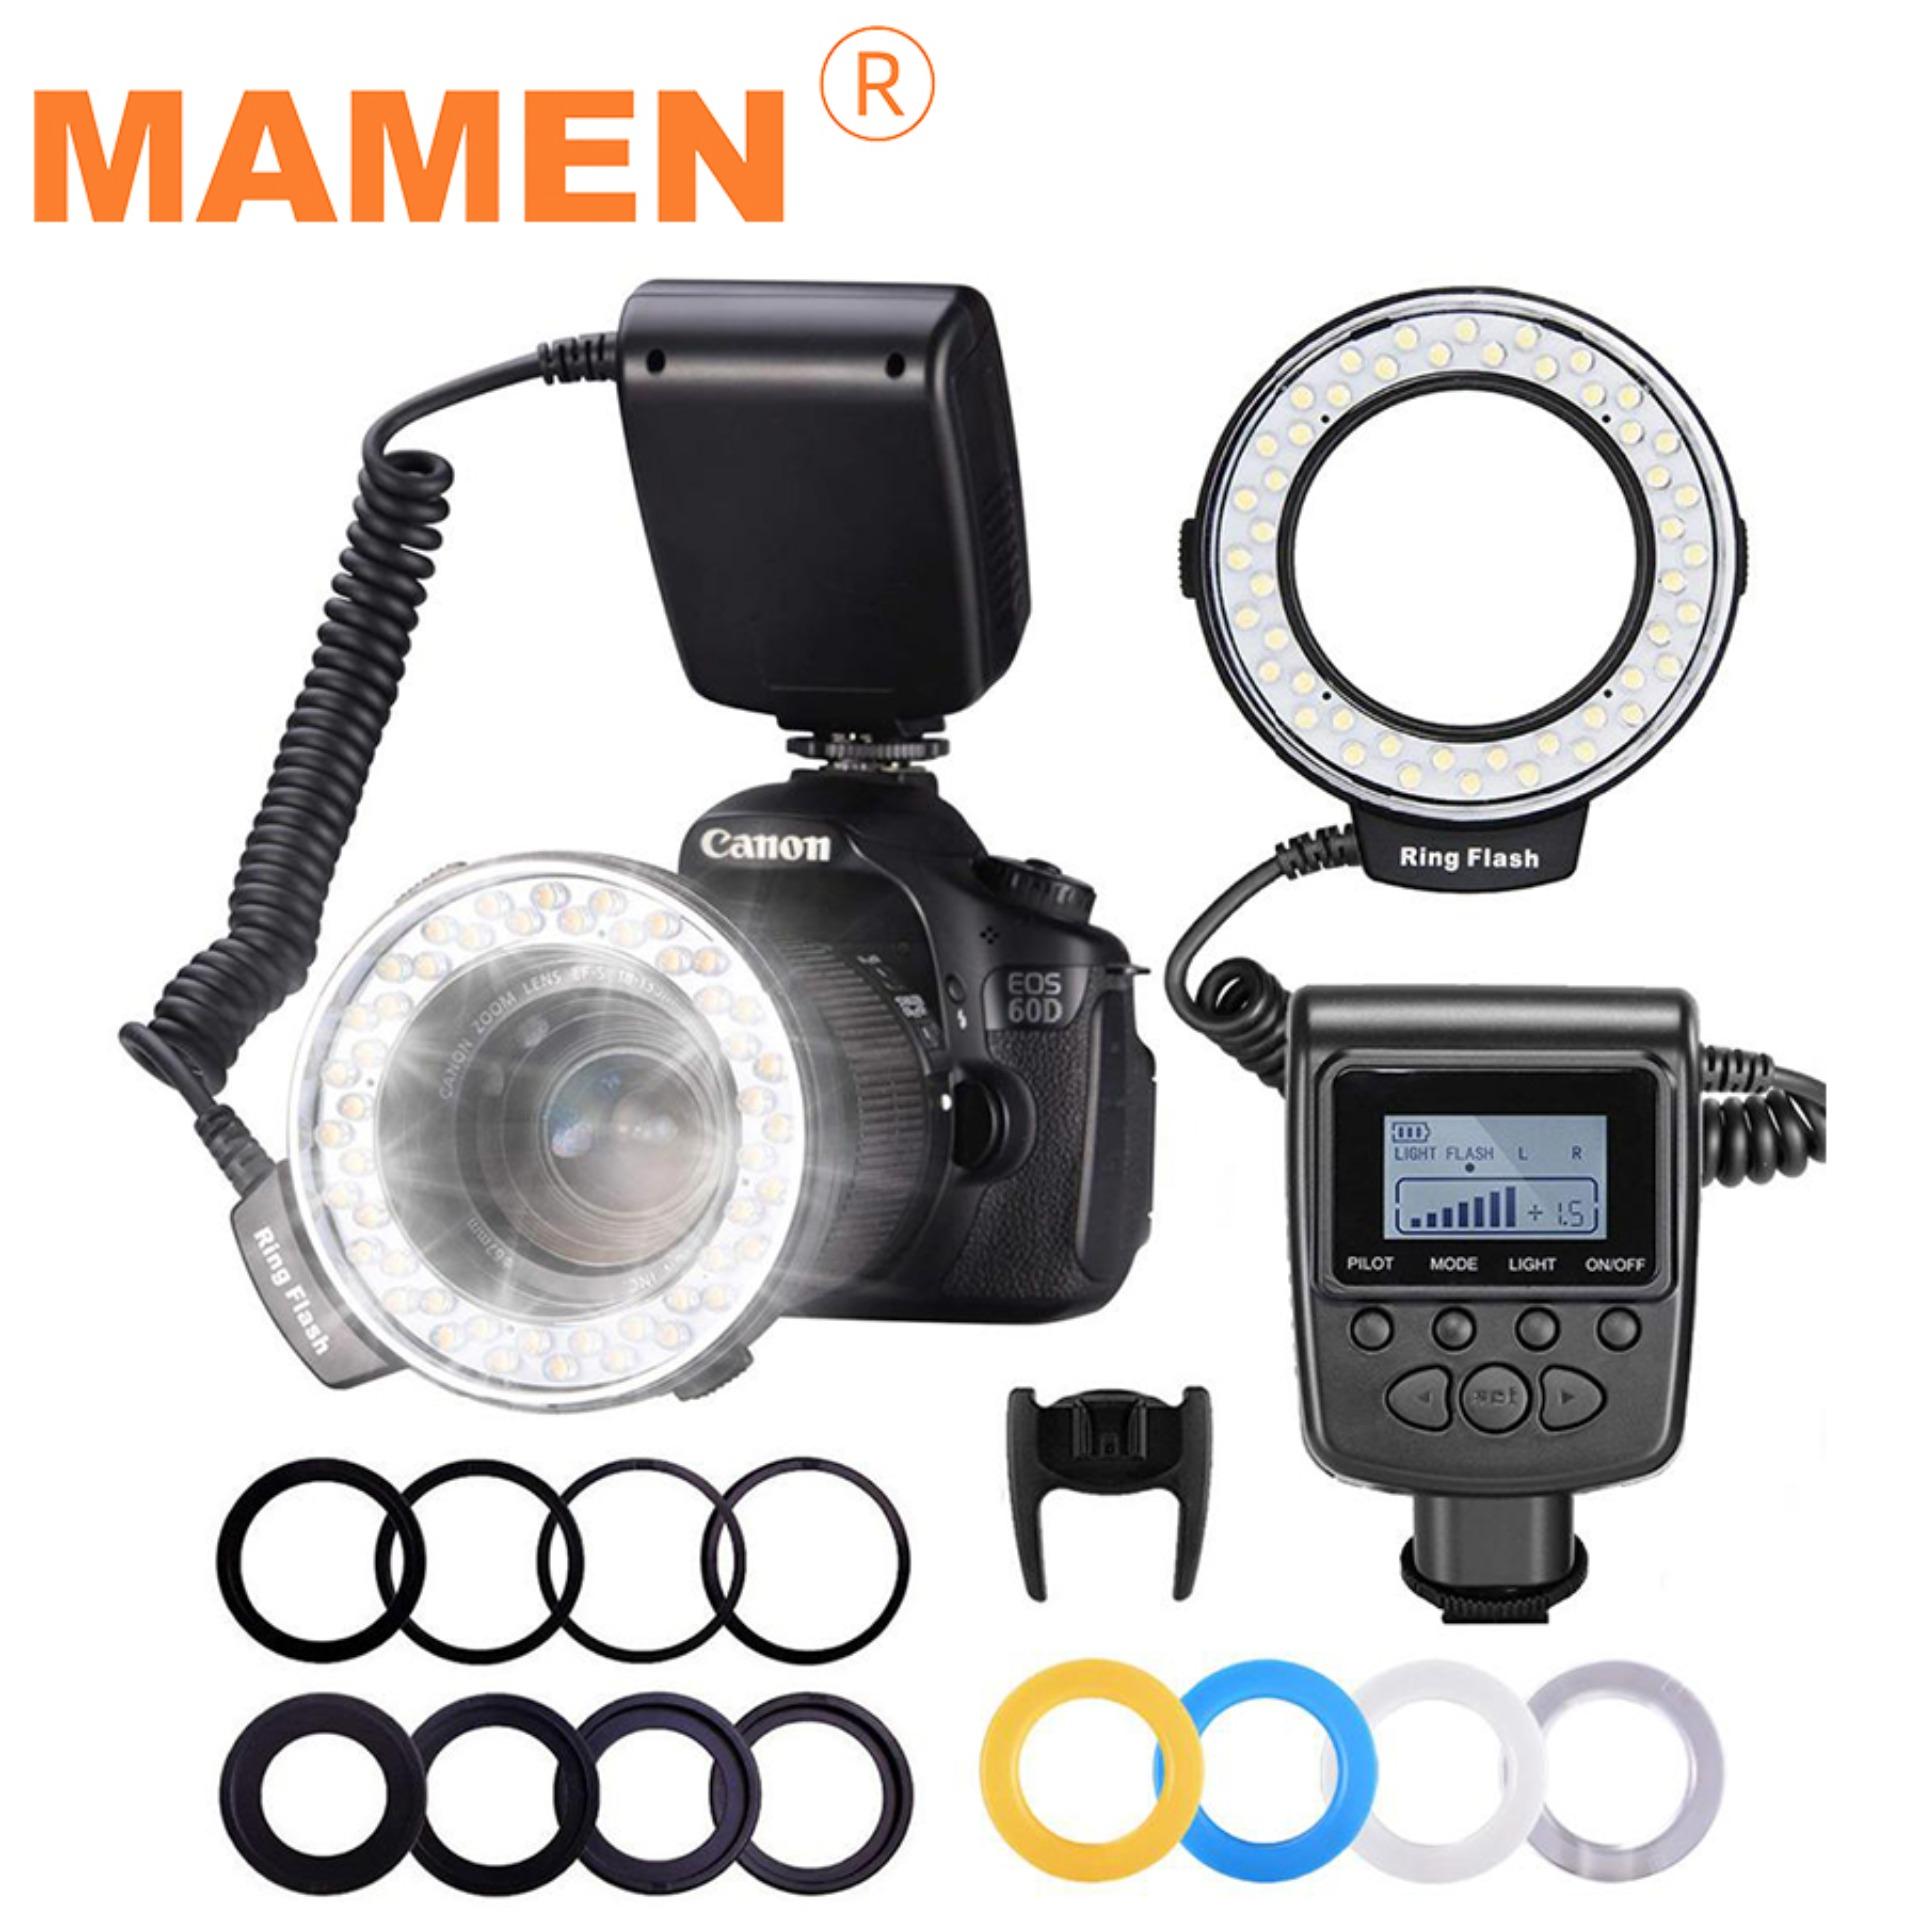 Mamen Rf-550d 48 Macro Led Ring Flash Light With 8 Adapter Ring For Nikon Canon Sony Pentax Olympus Panasonic Camera Dslr Ring Flash Kit.